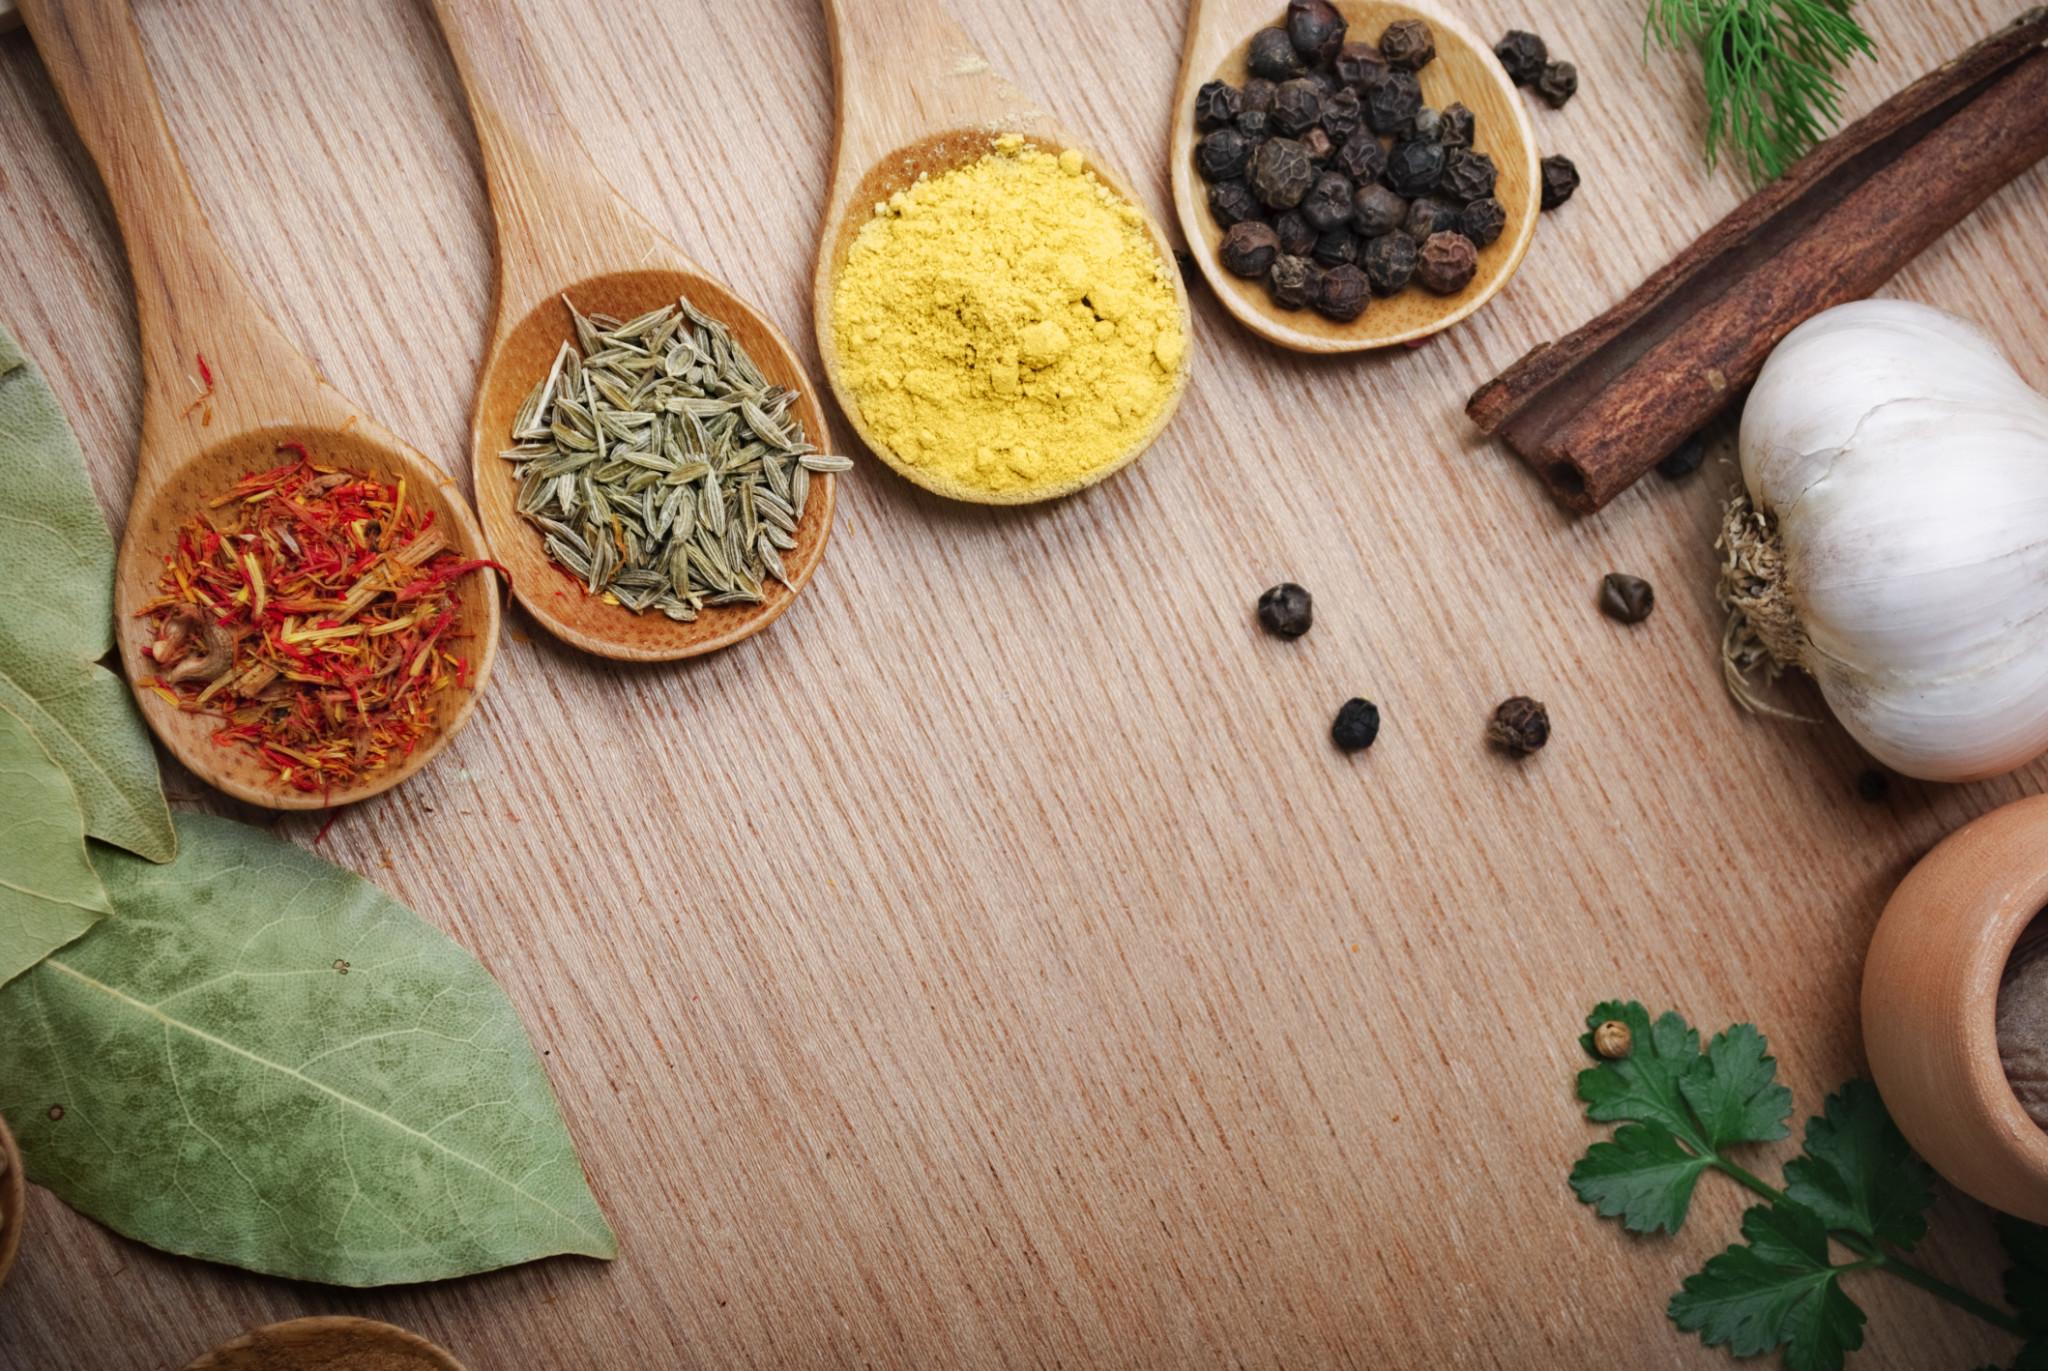 Dimagrire con spezie e aromi l 39 urlo - Spezie in cucina ...